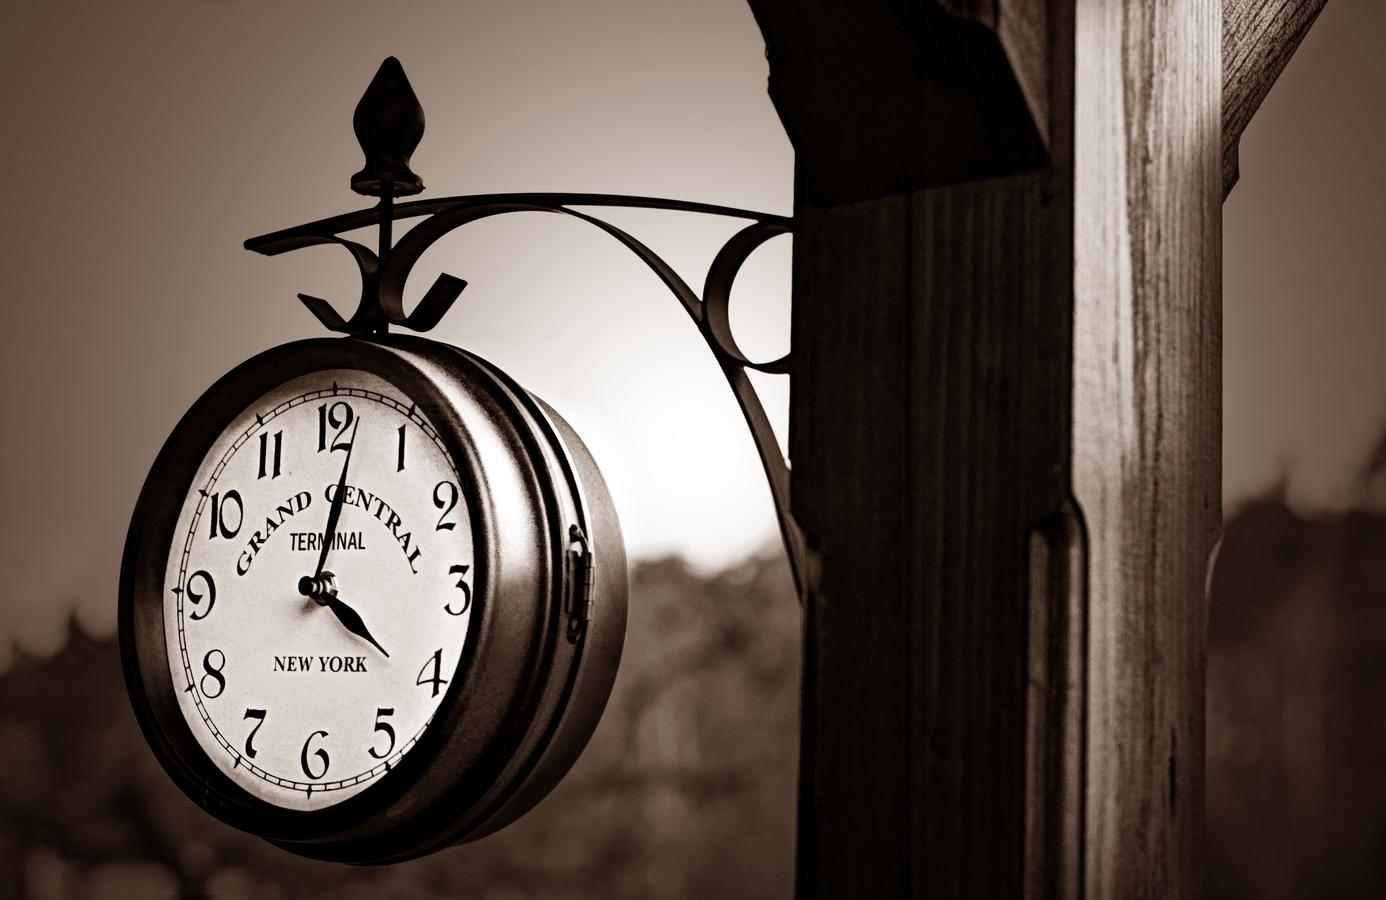 16:02 h.